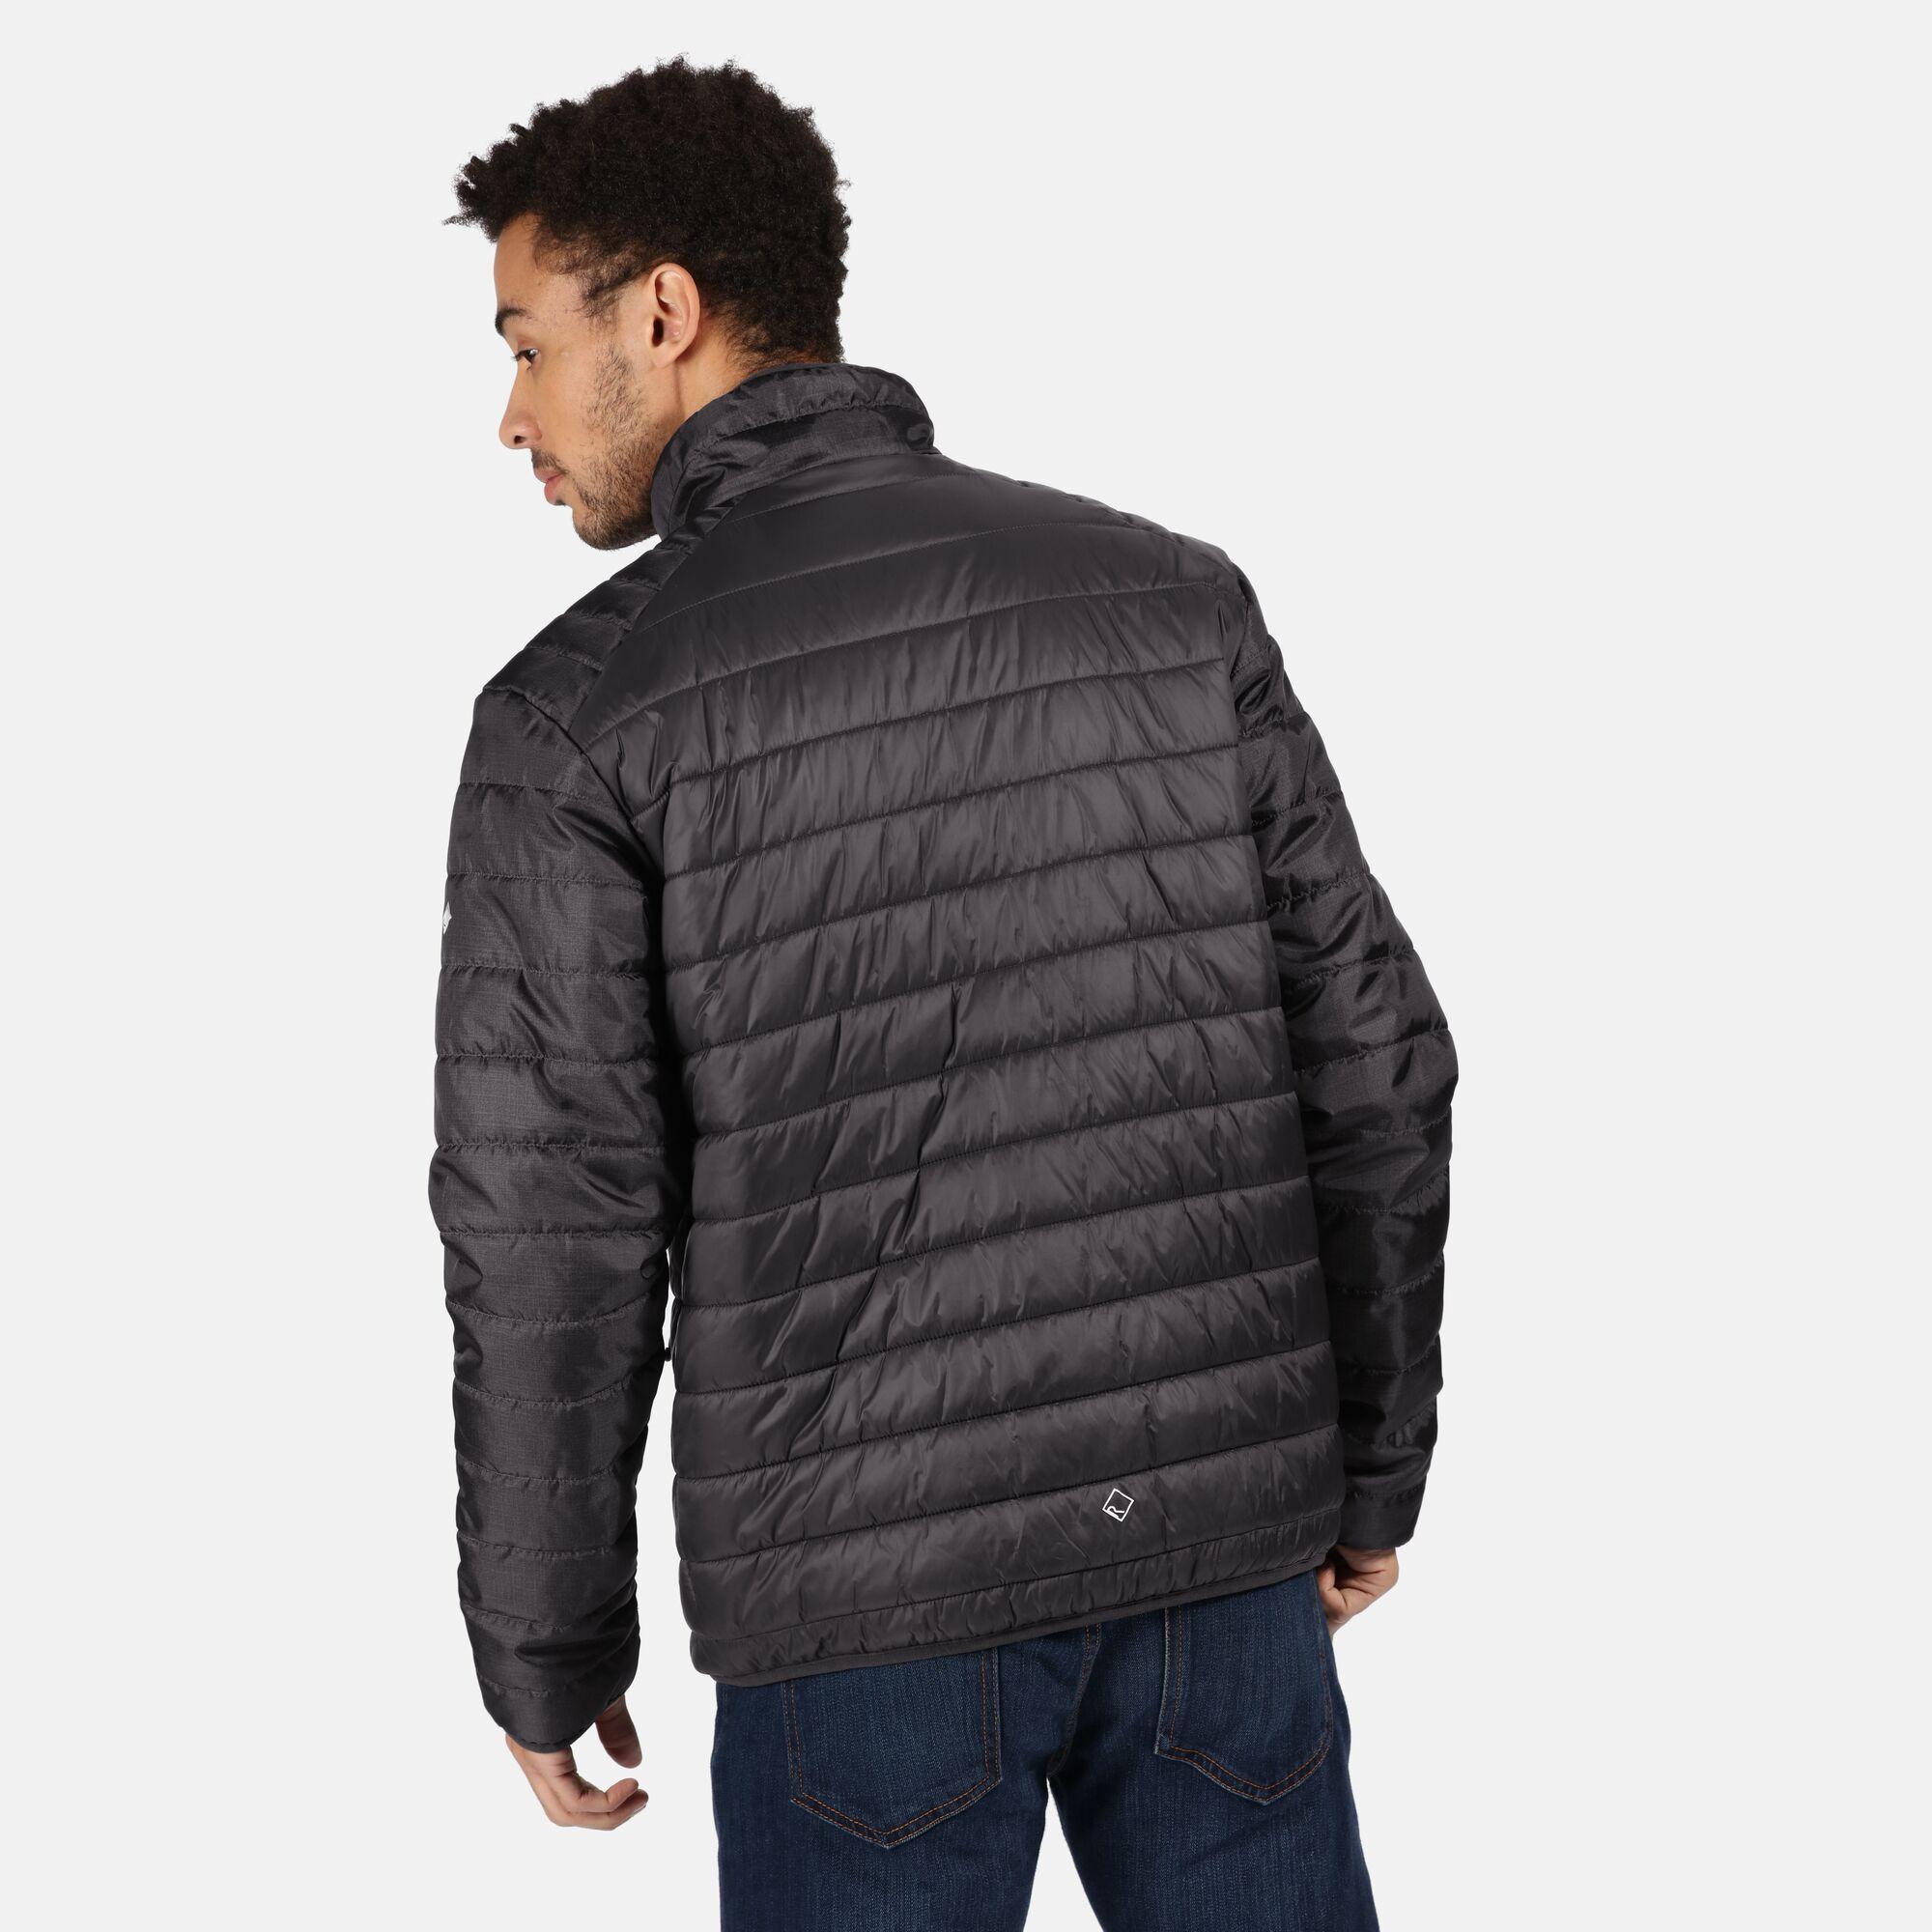 Regatta Mens Freezeway II Insulated Jacket (Ash)